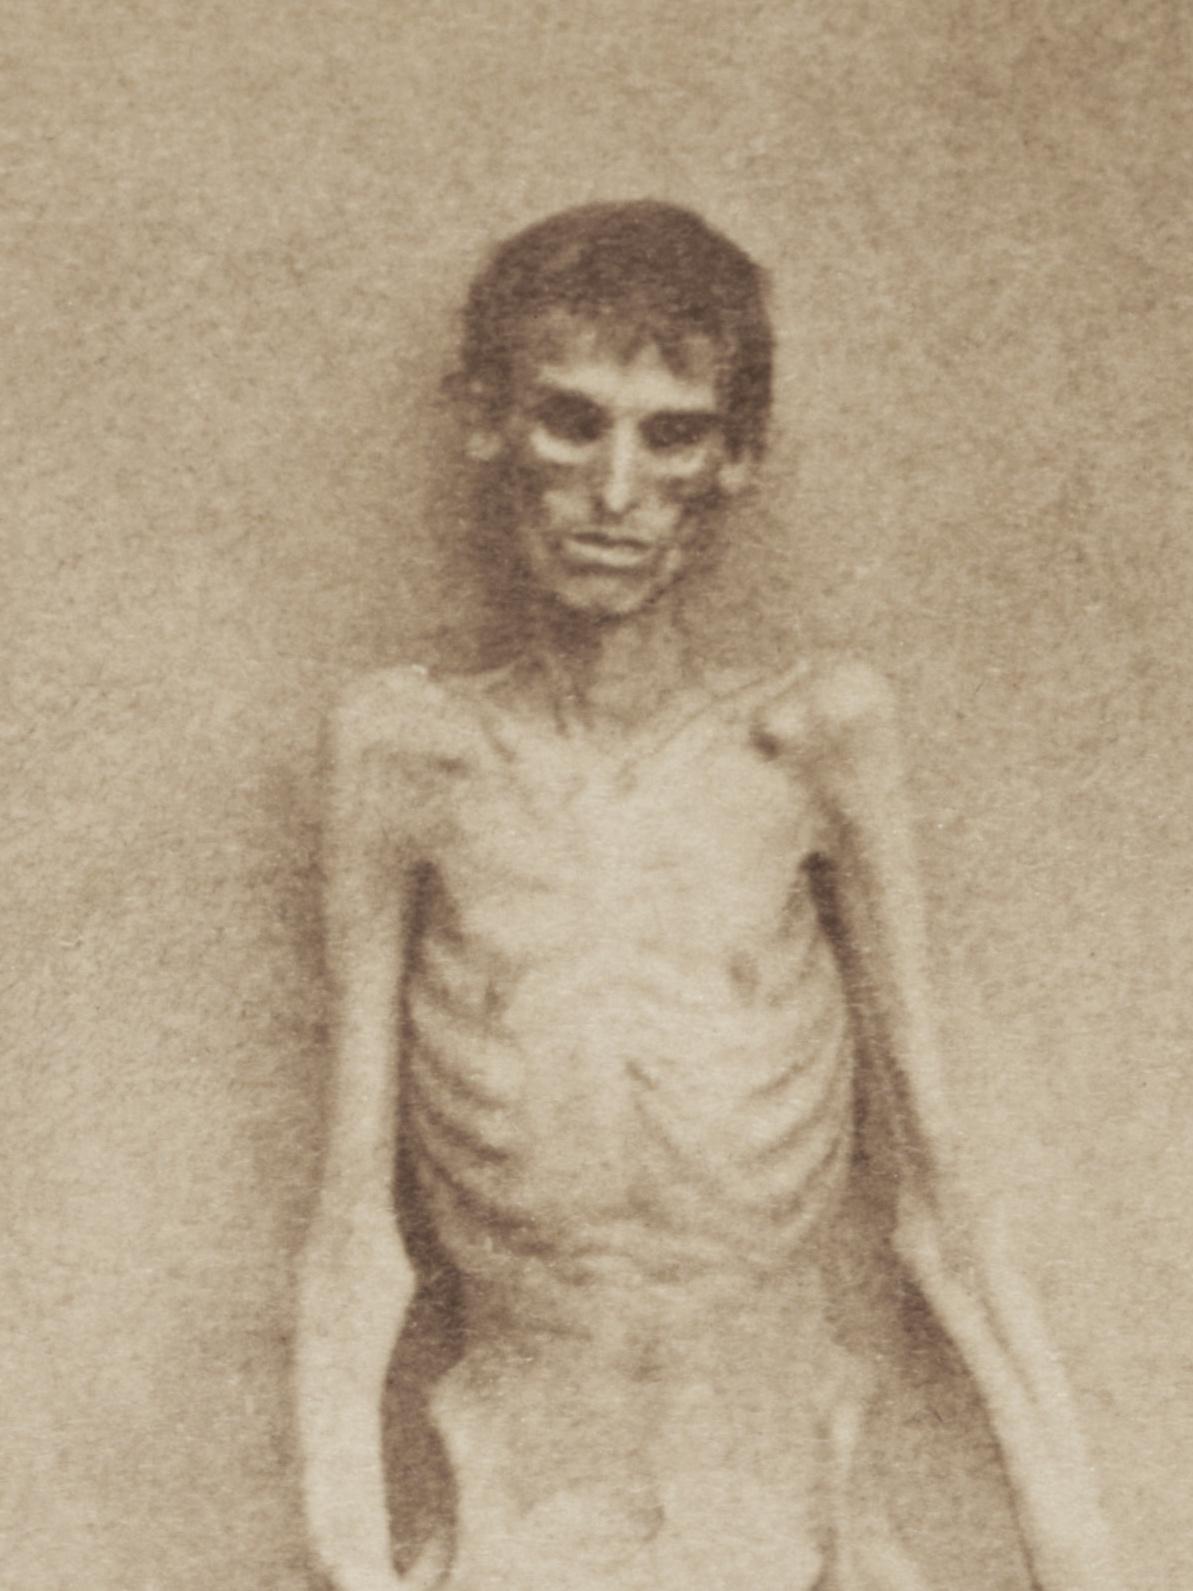 Union soldier Andersonville survivor